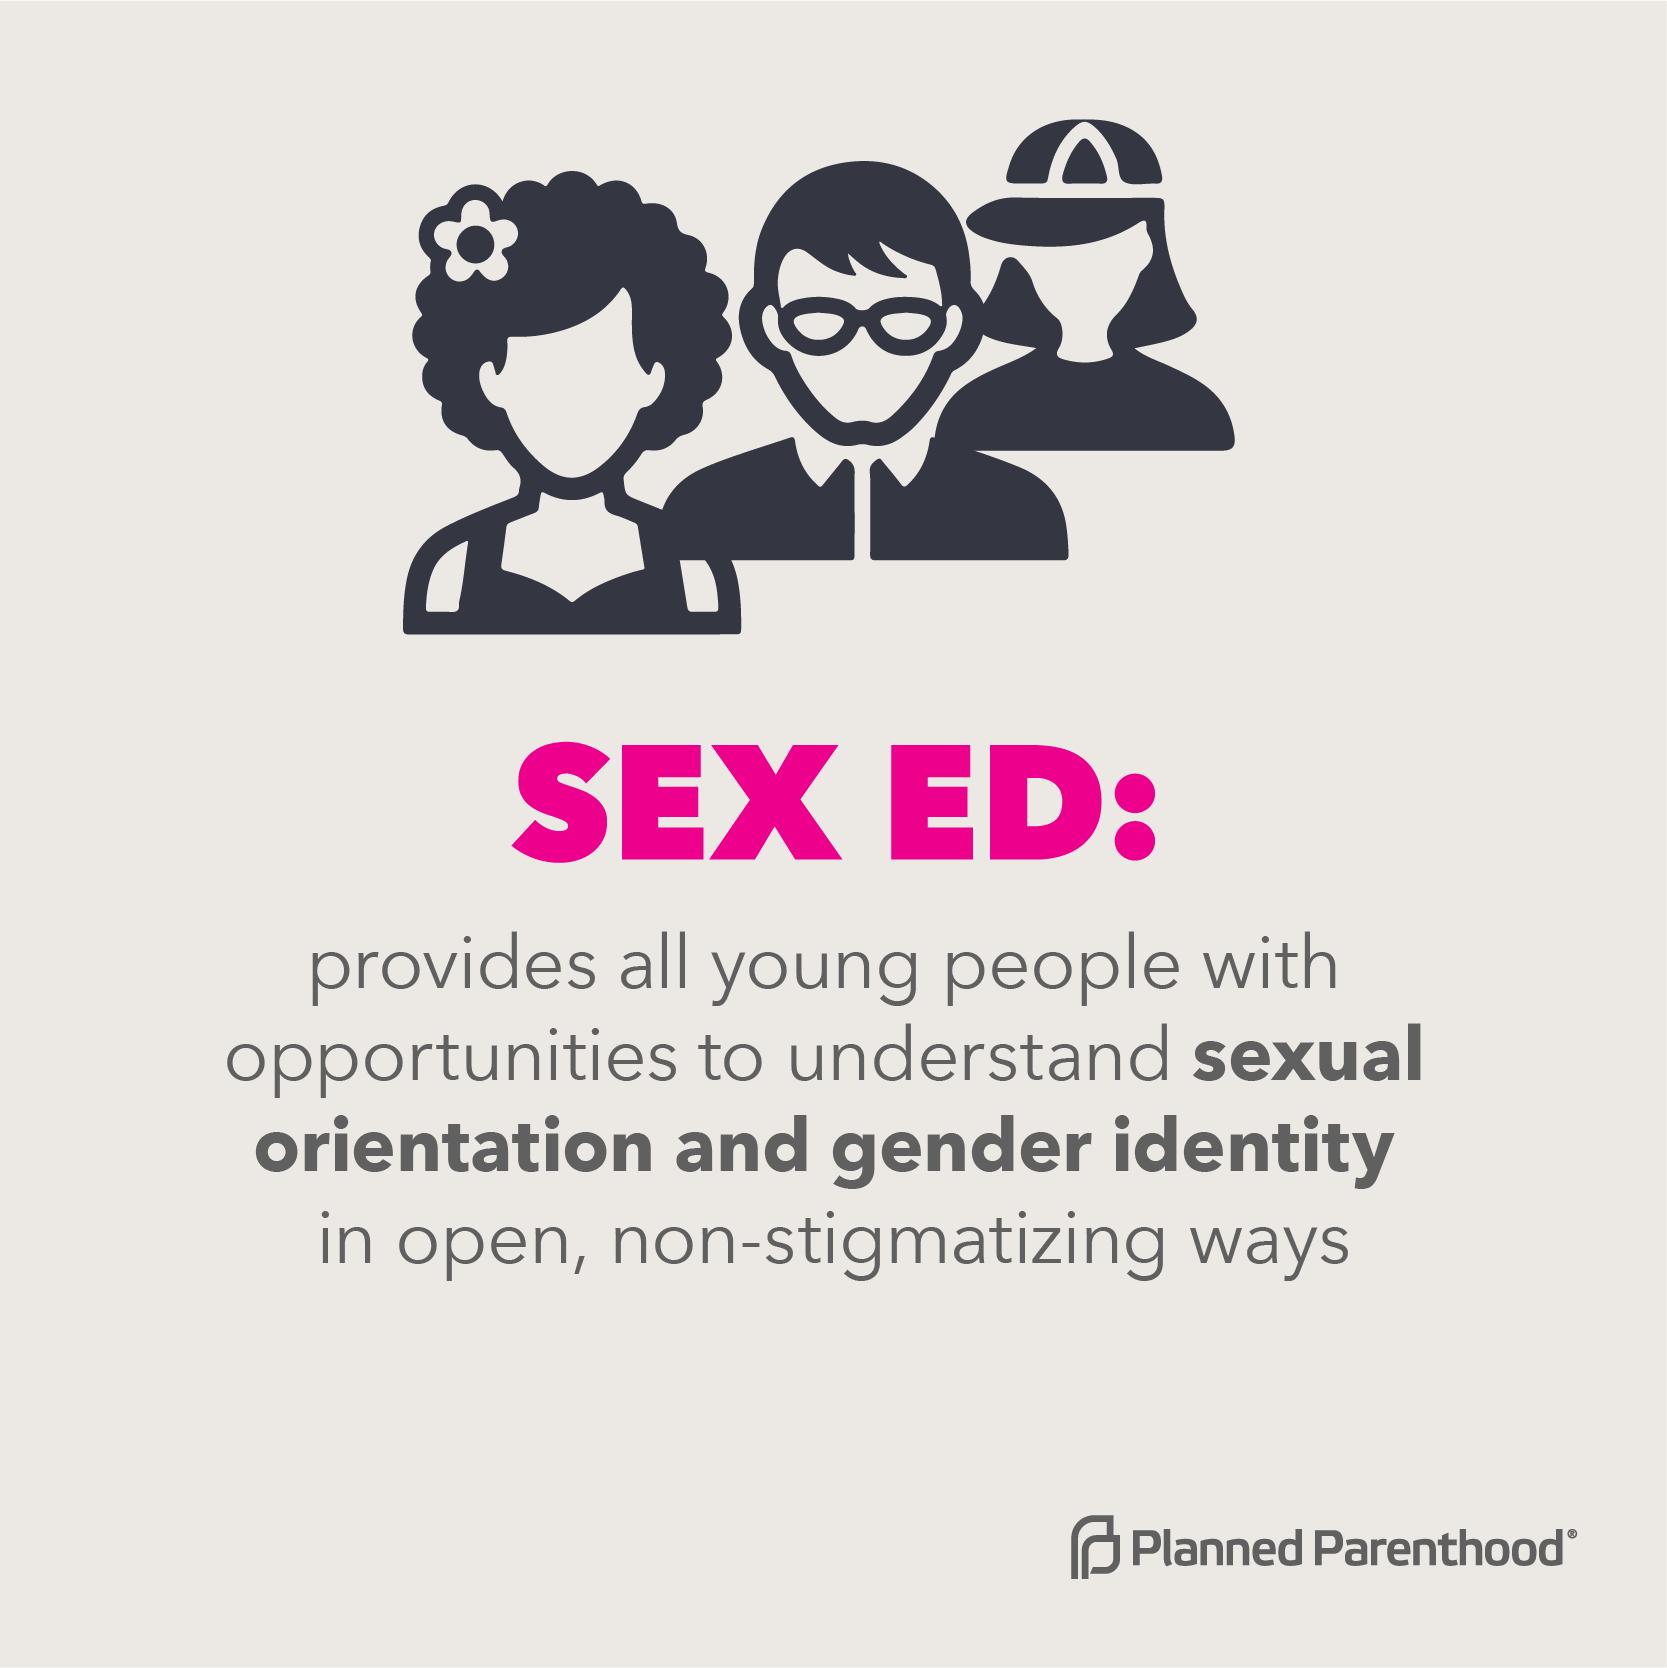 Sex ed: